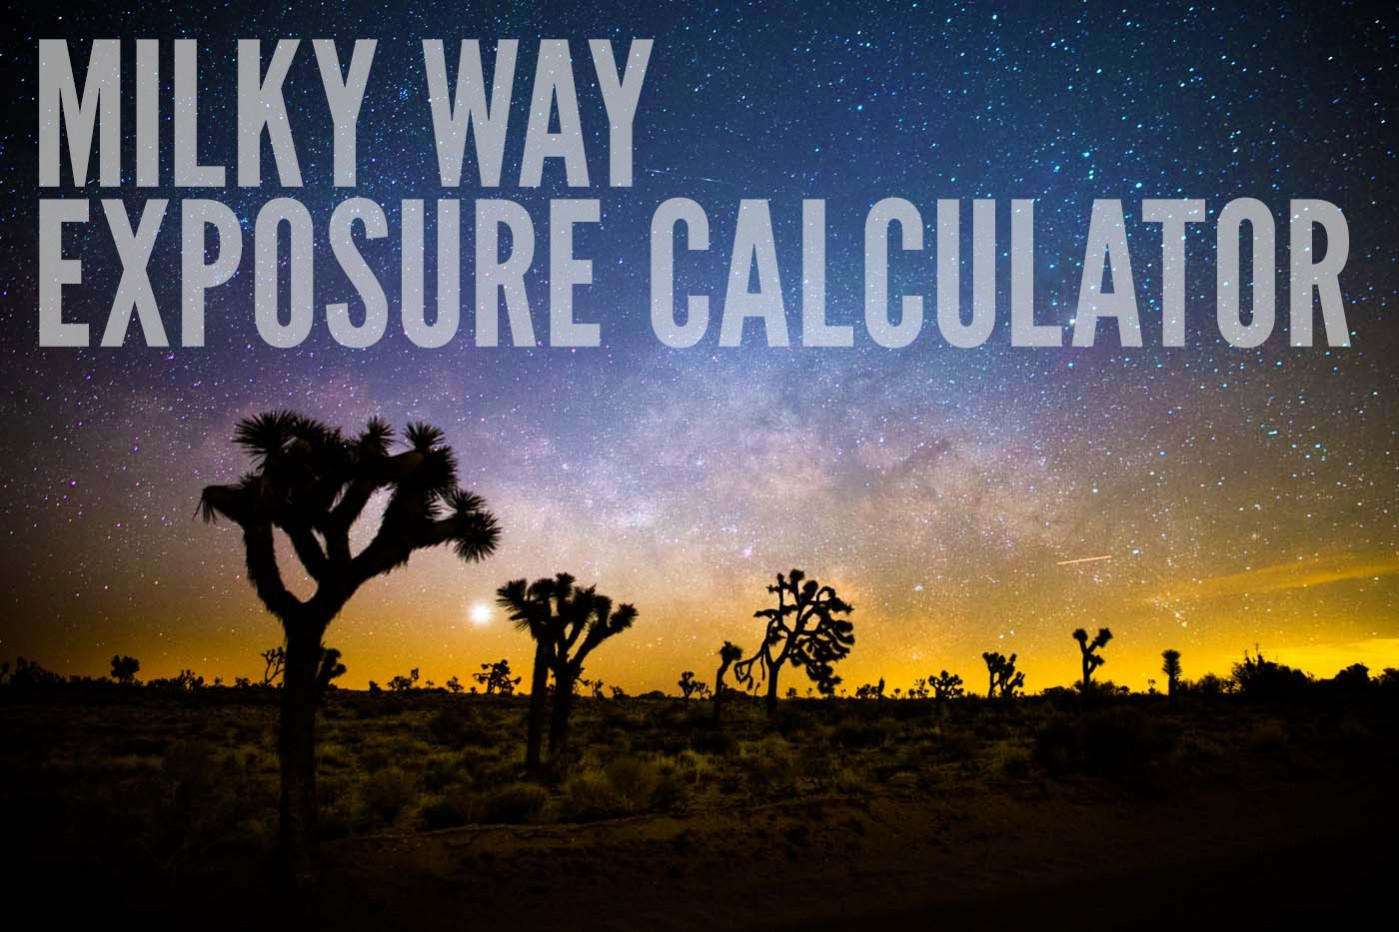 Milky Way Exposure Calculator – Lonely Speck